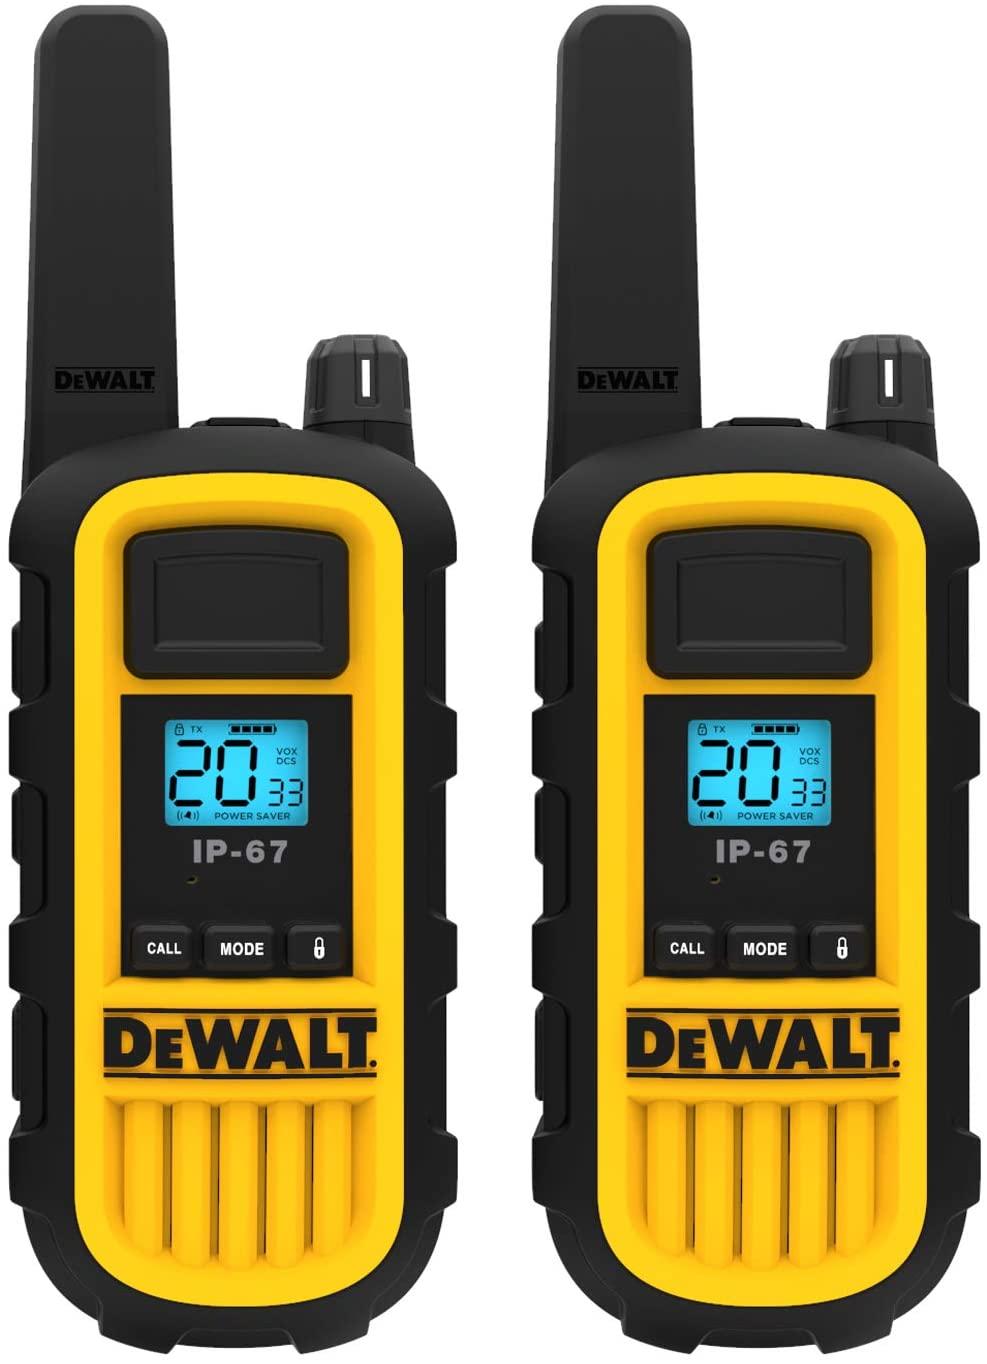 DeWalt DXFRS800